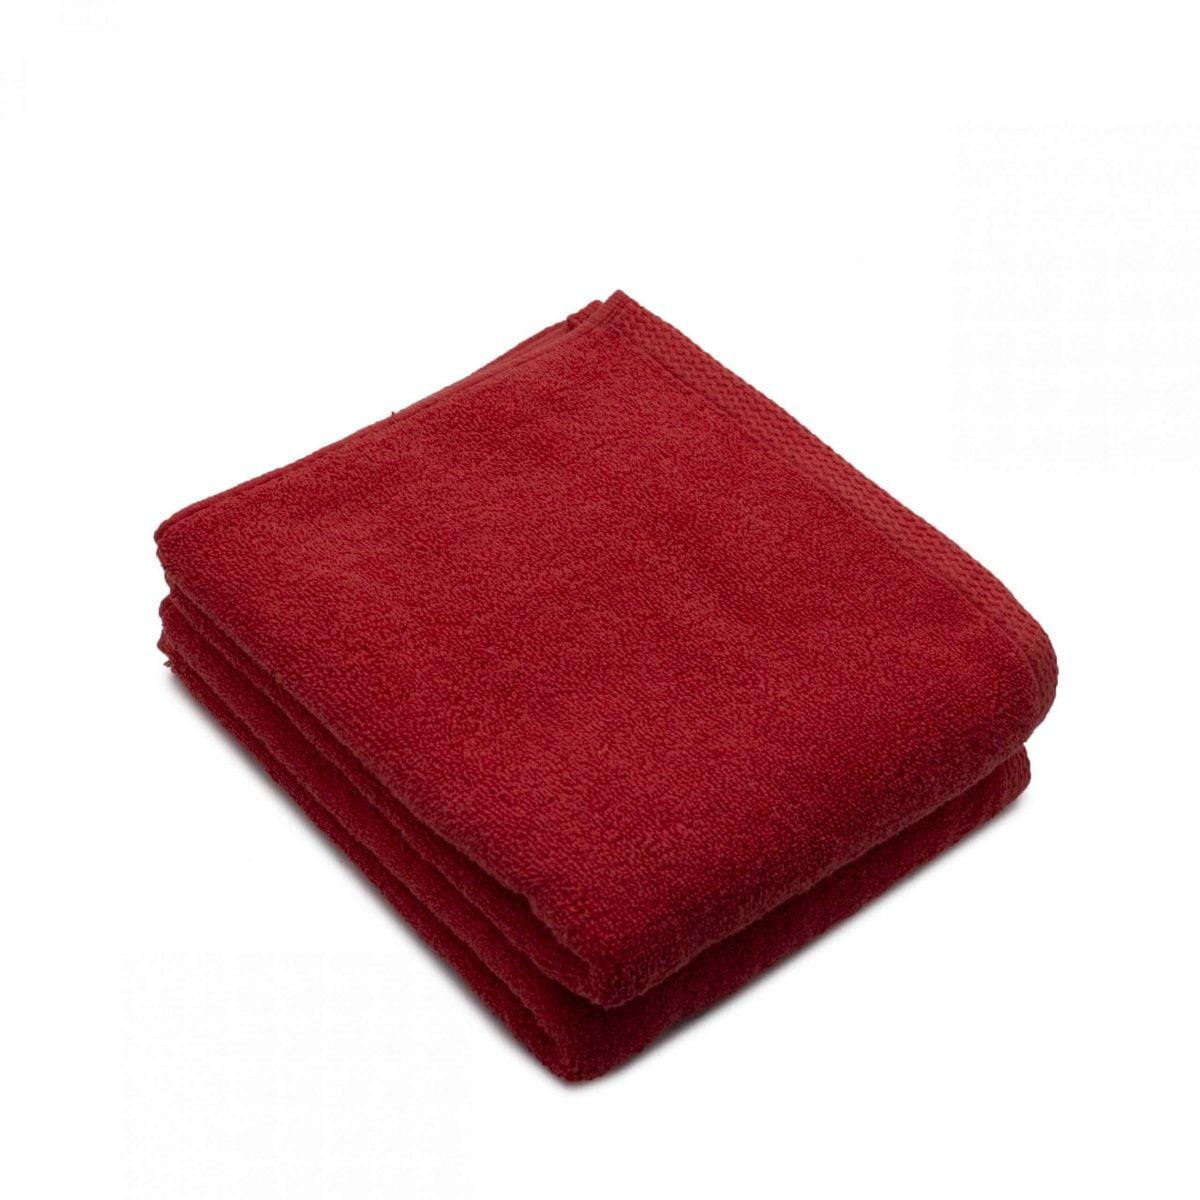 Set 2 prosoape de fata bumbac 100%, 600gsm, Somnart, 50x90cm, rosu